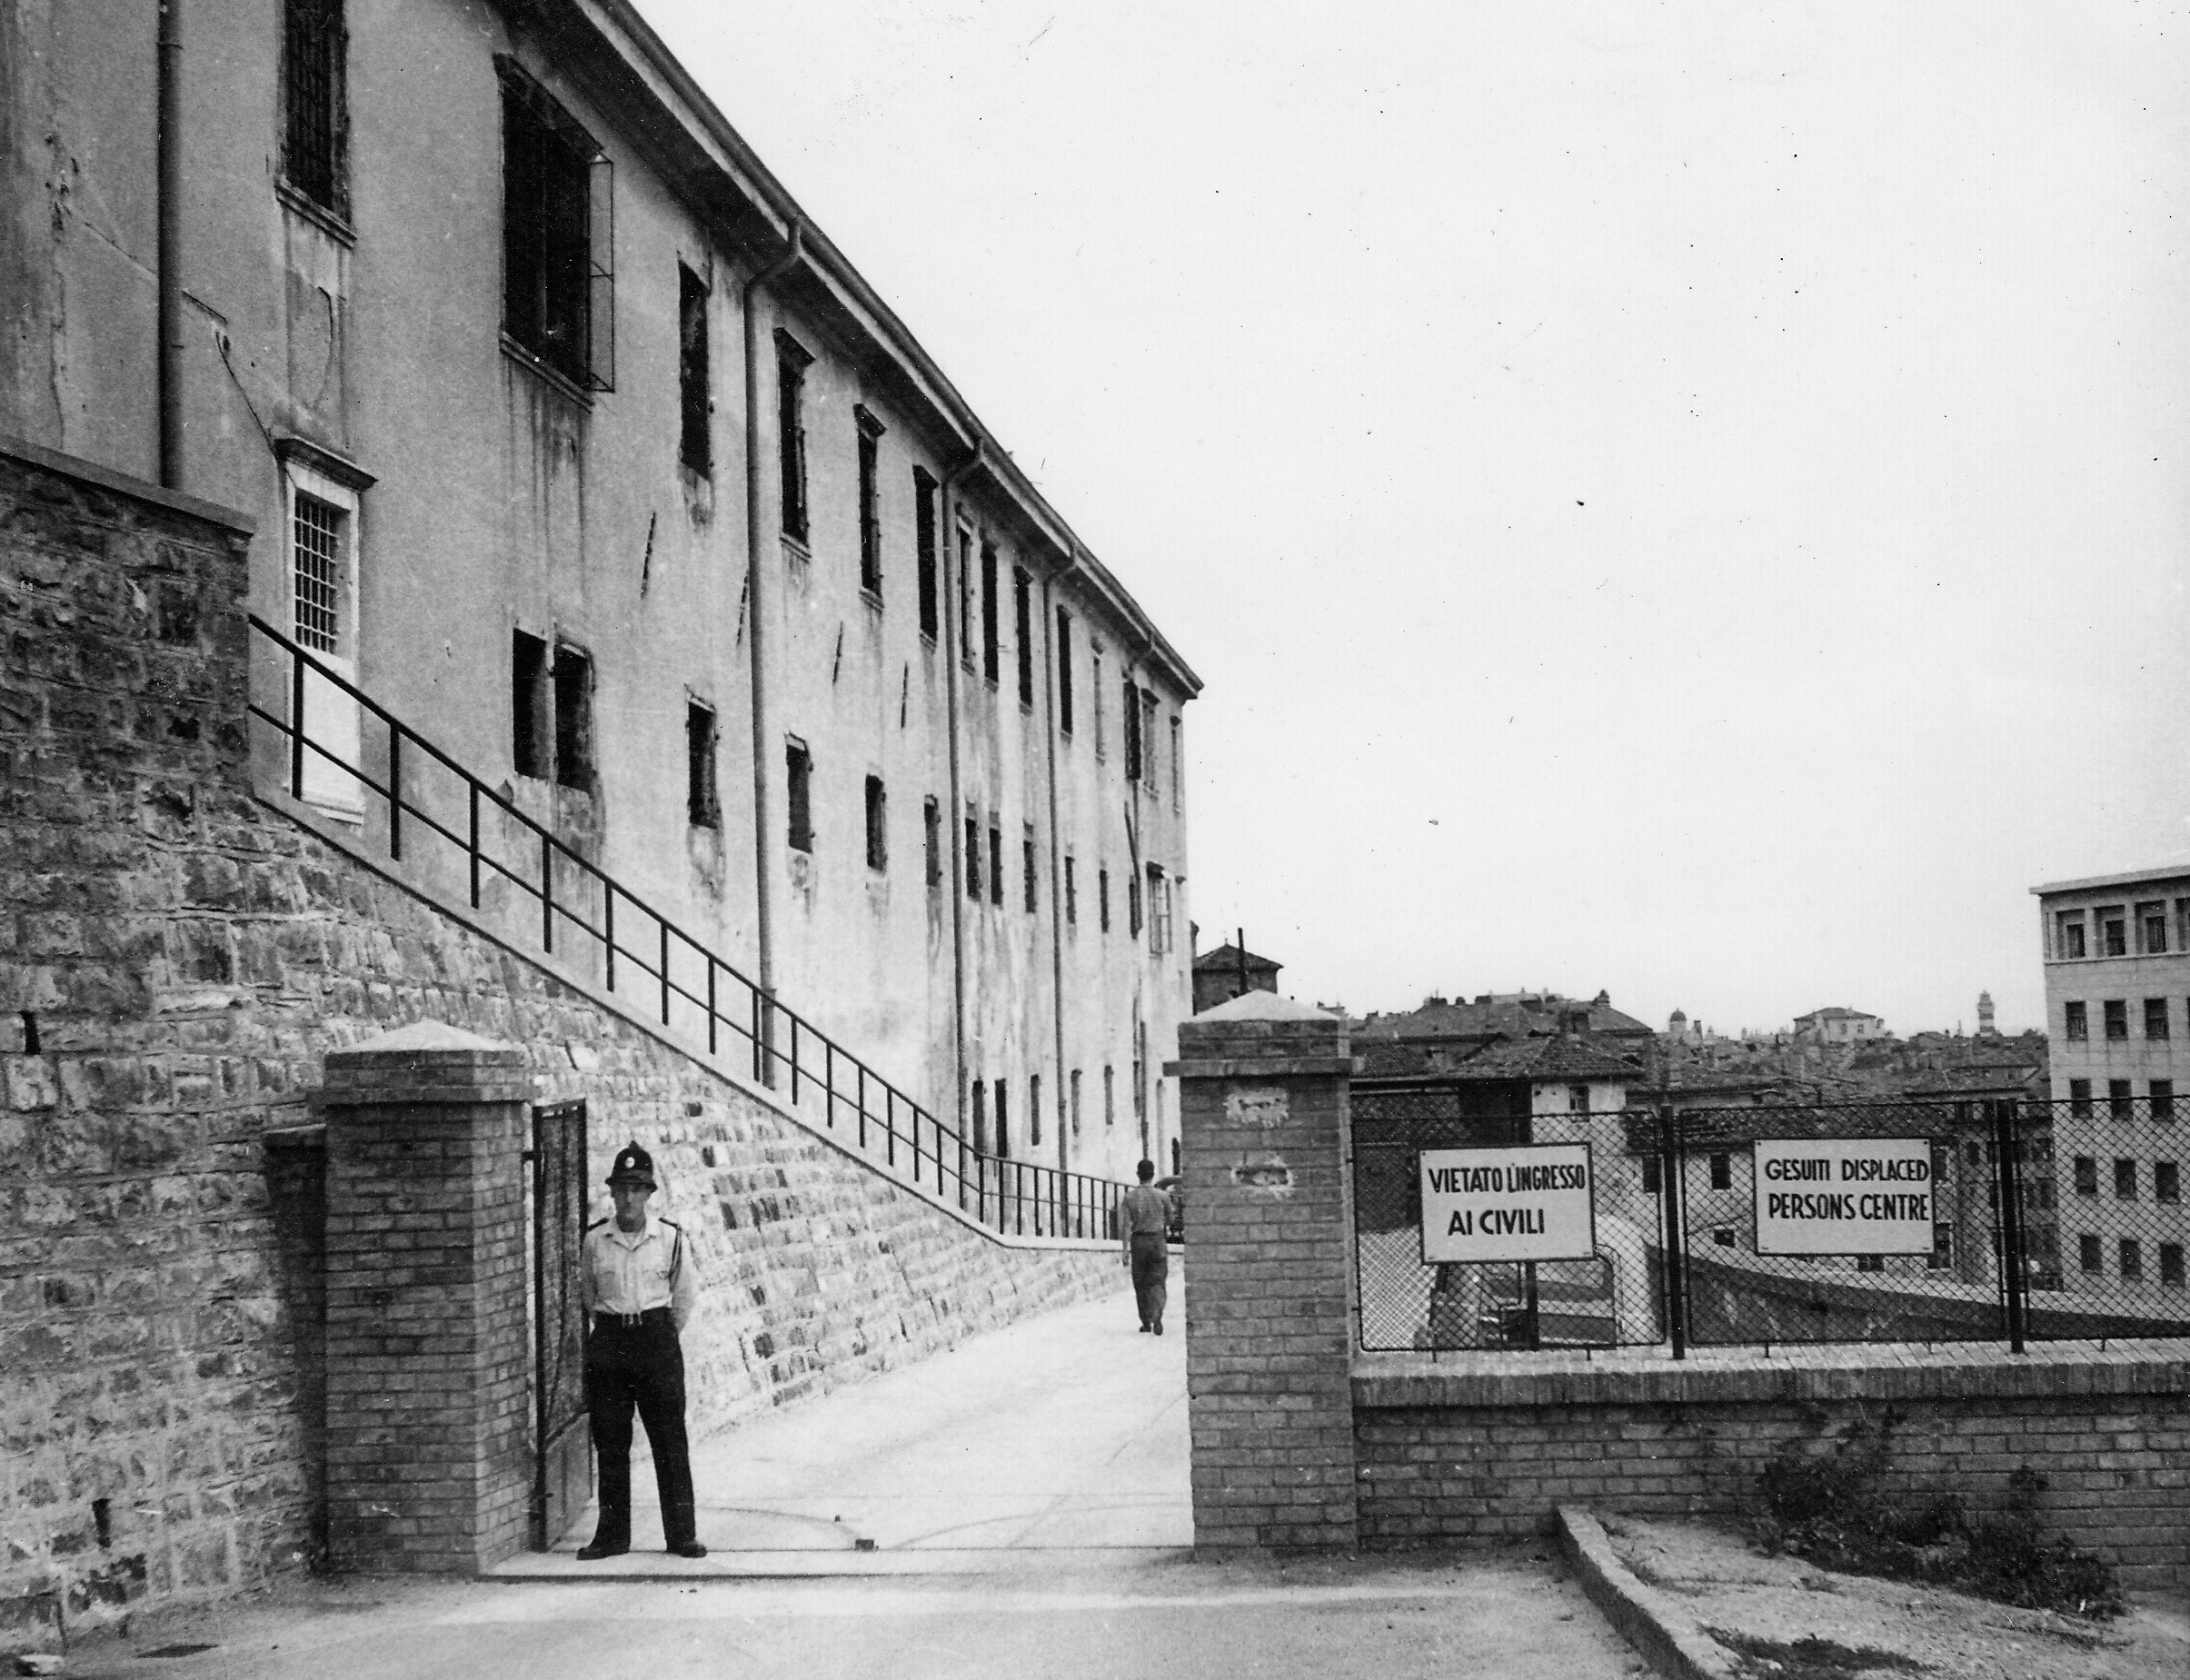 Gesuiti Displaced Persons Camp 1950-51